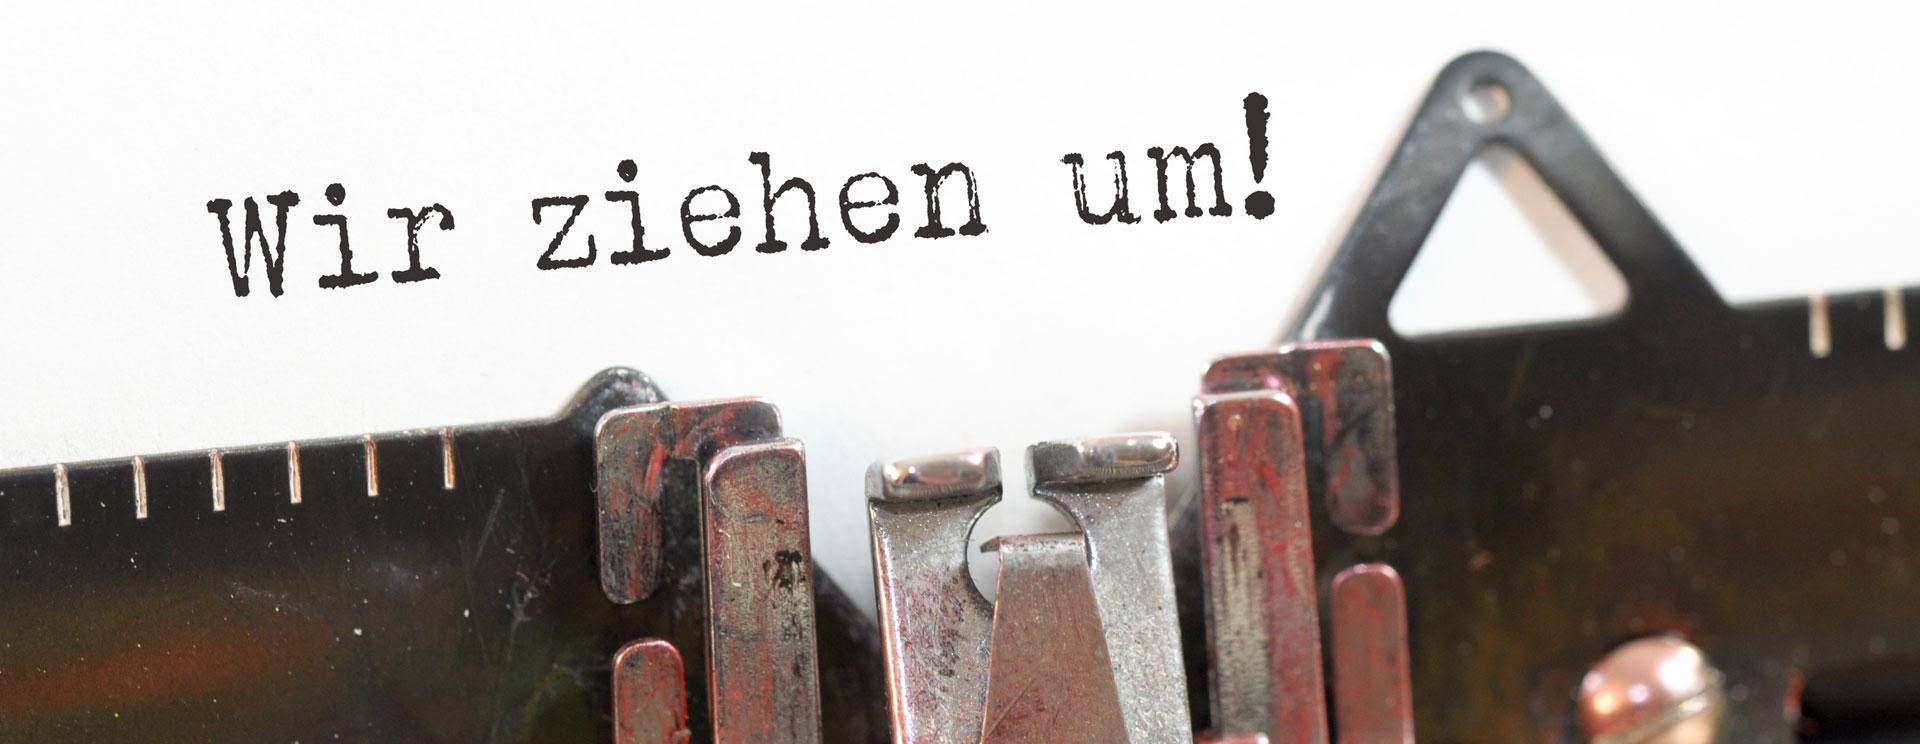 Umzug Wien: Formica Umzugstransporte